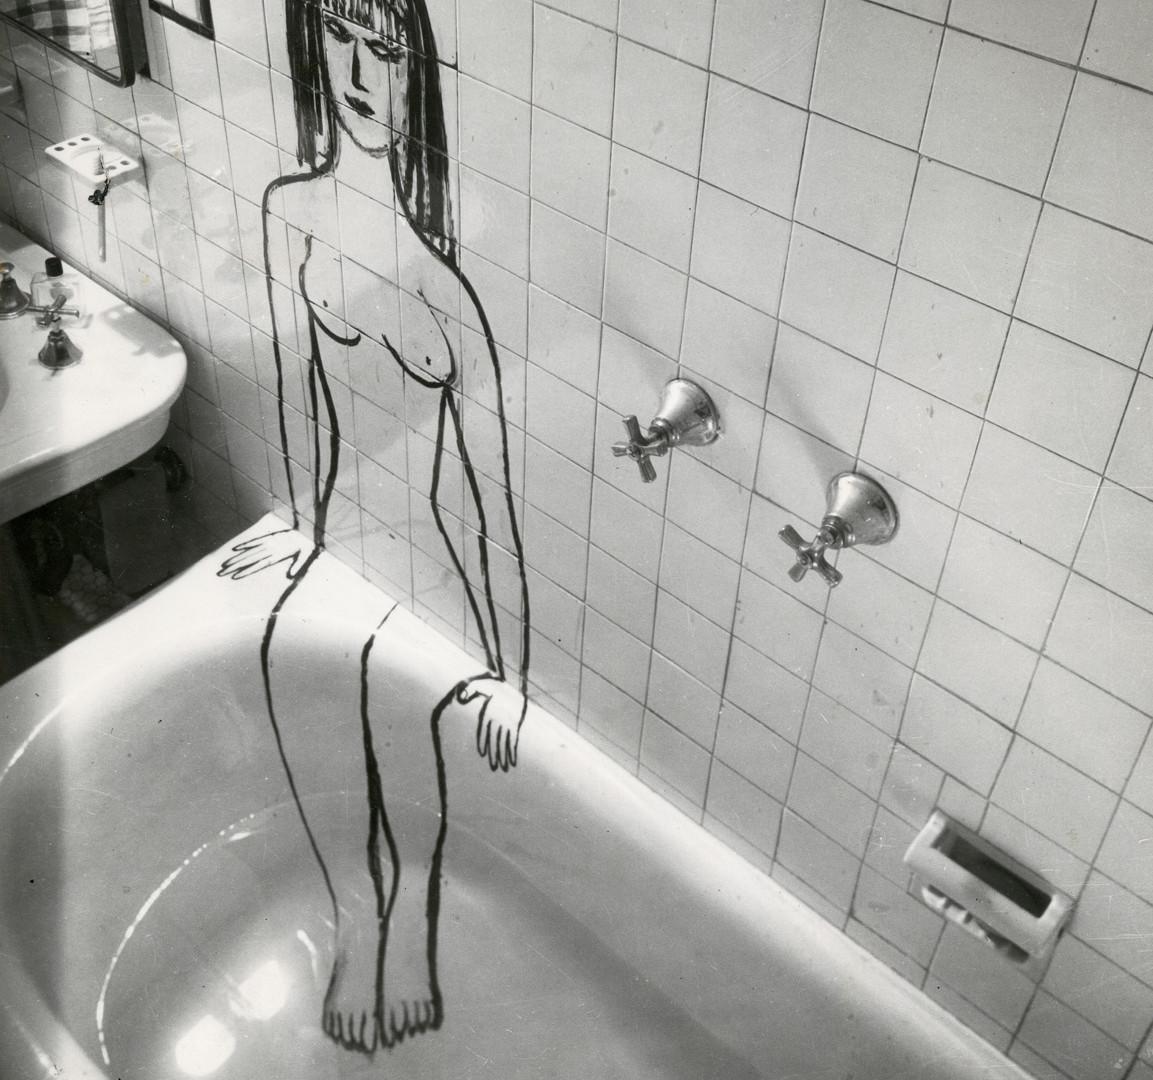 Saul Steinberg, Woman in Tub, 1949